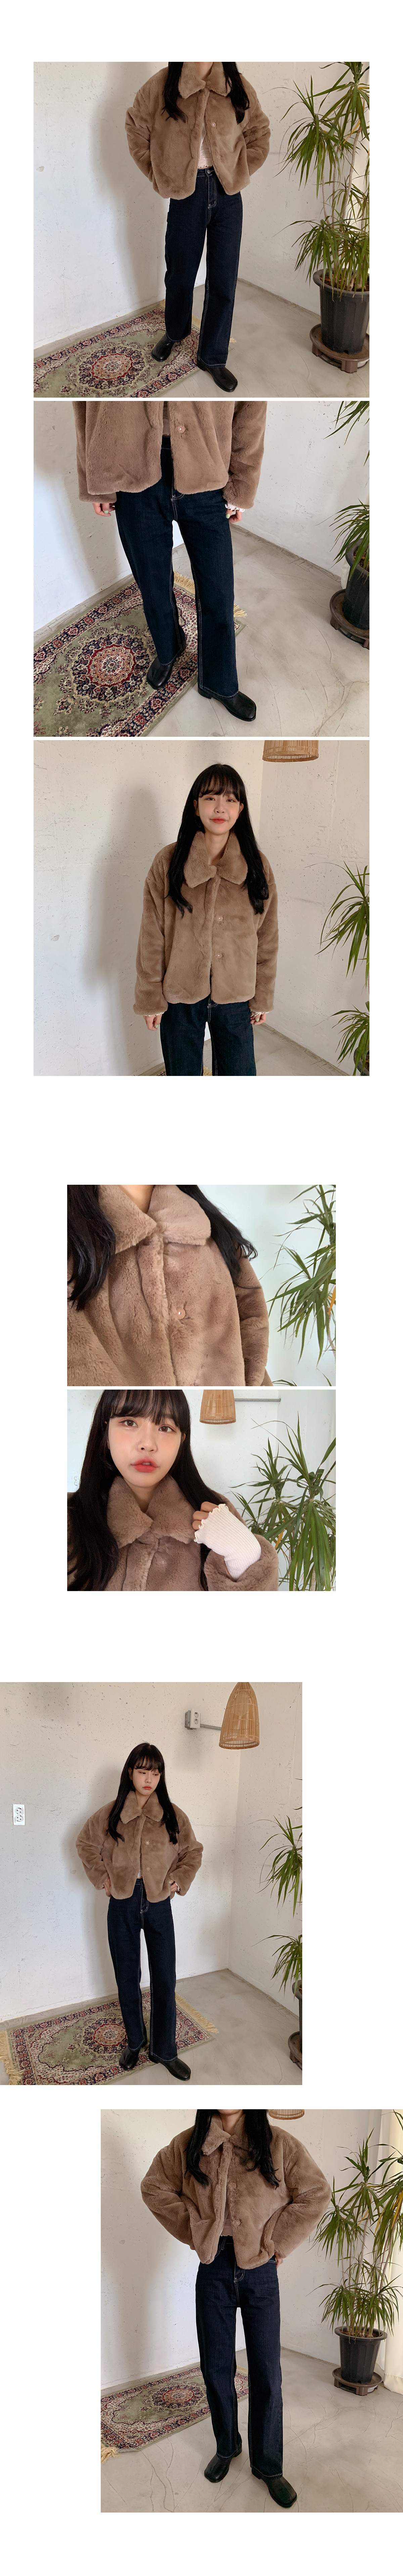 Elin fur jacket